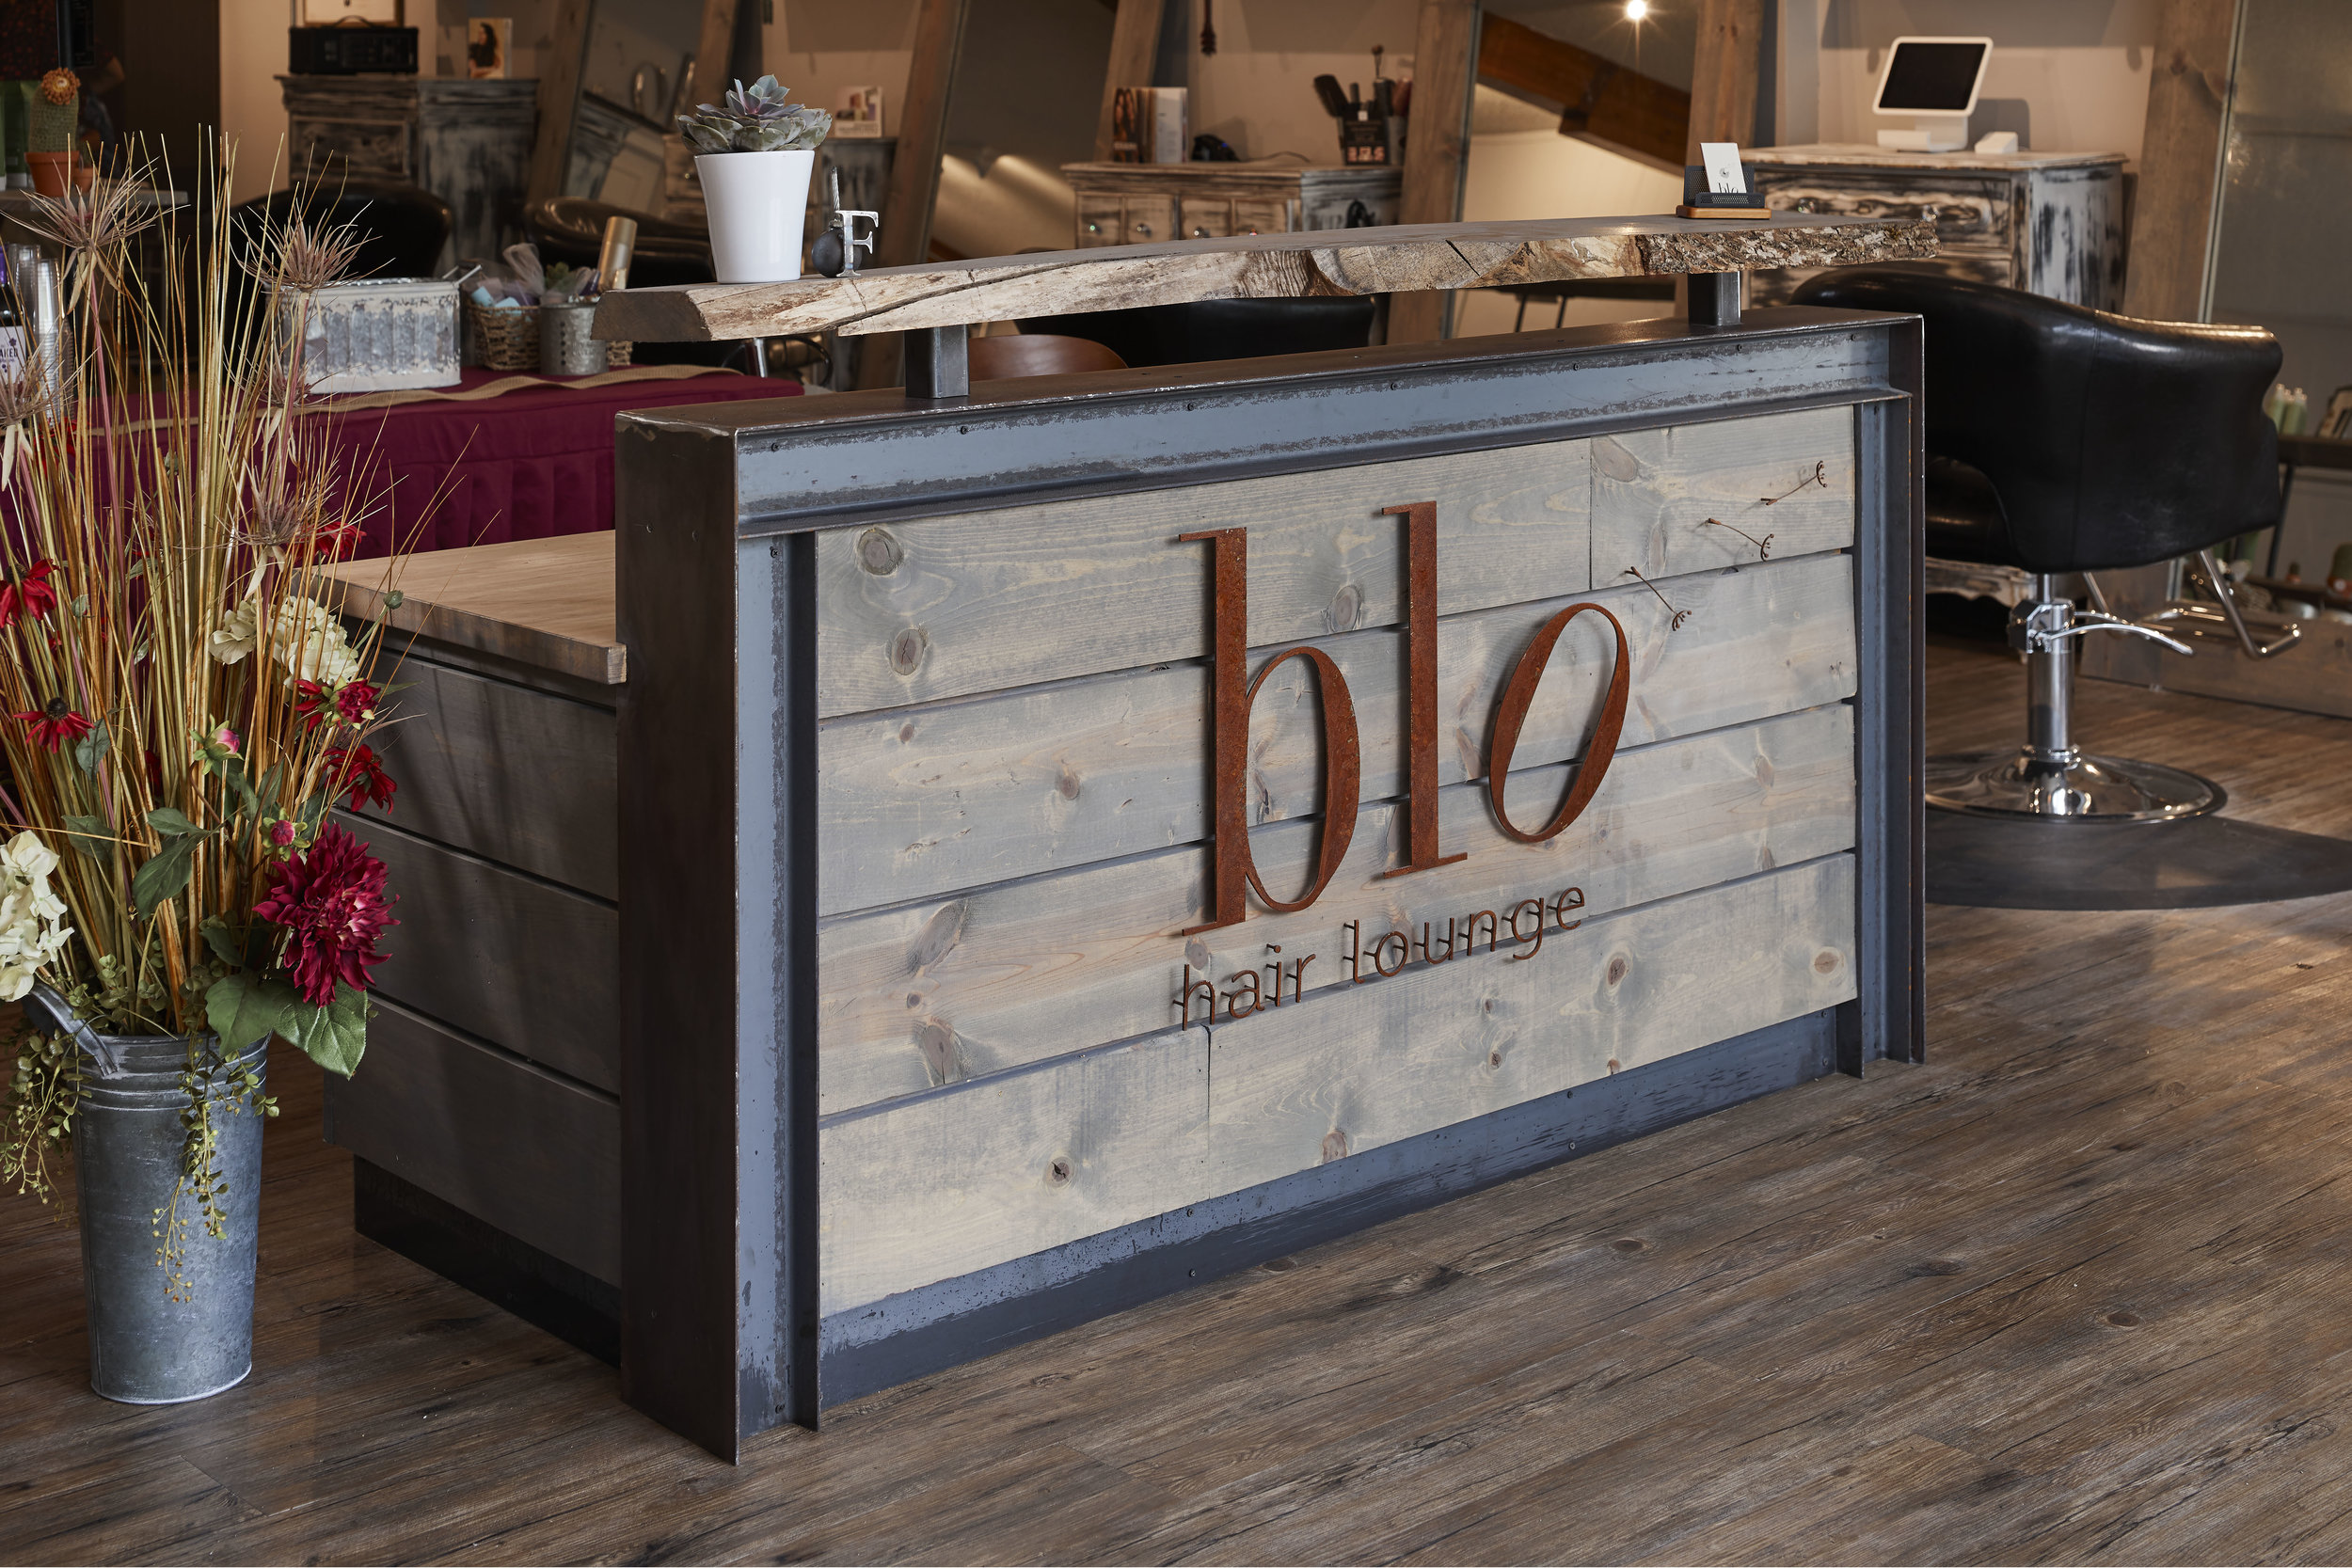 blo hair lounge 2018.08_001 copy.jpg